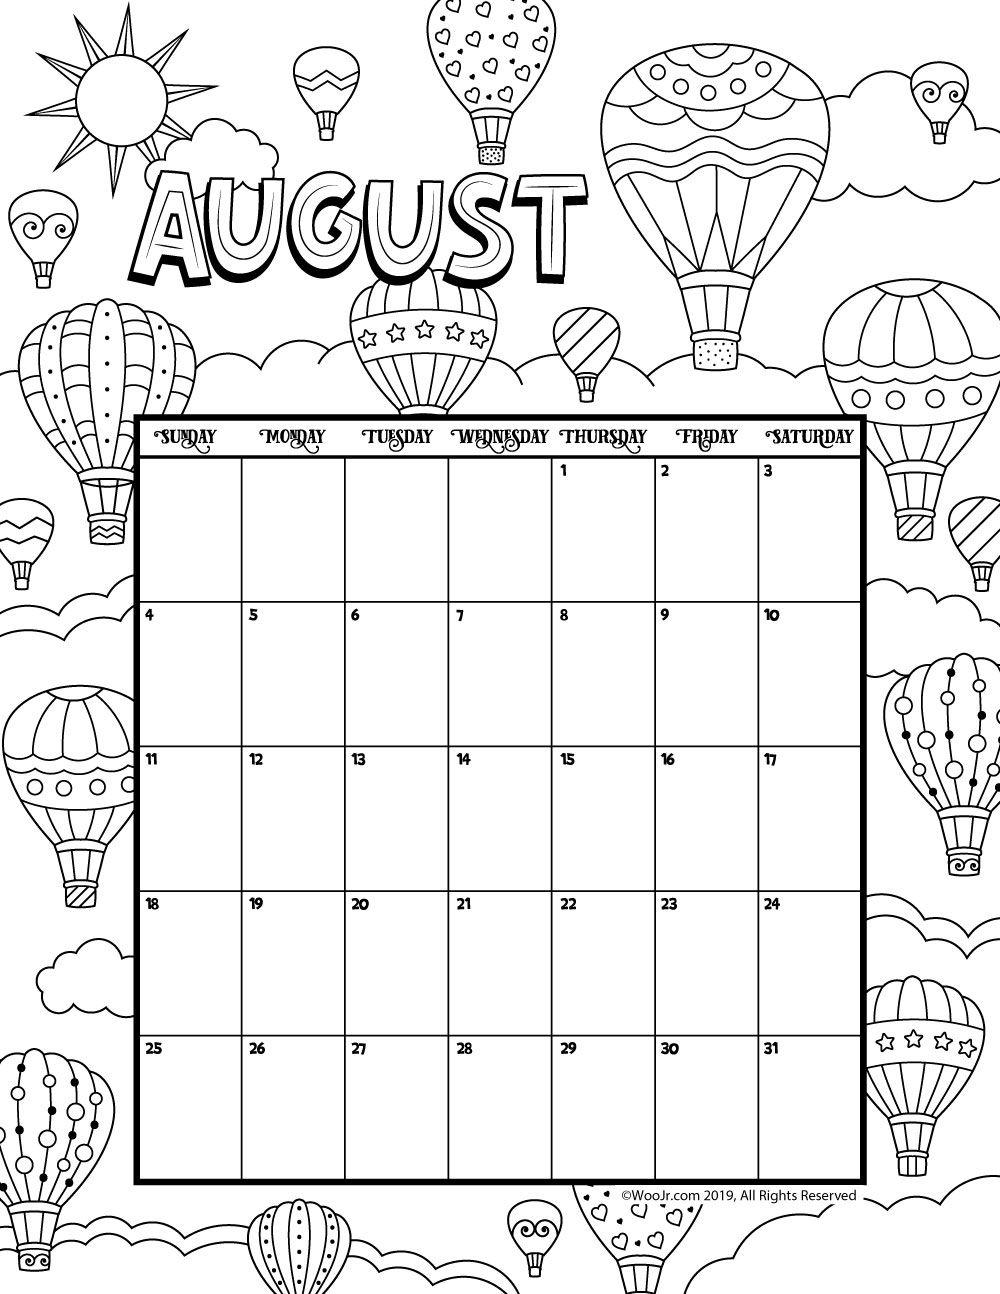 august 2019 coloring calendar kids calendar coloring